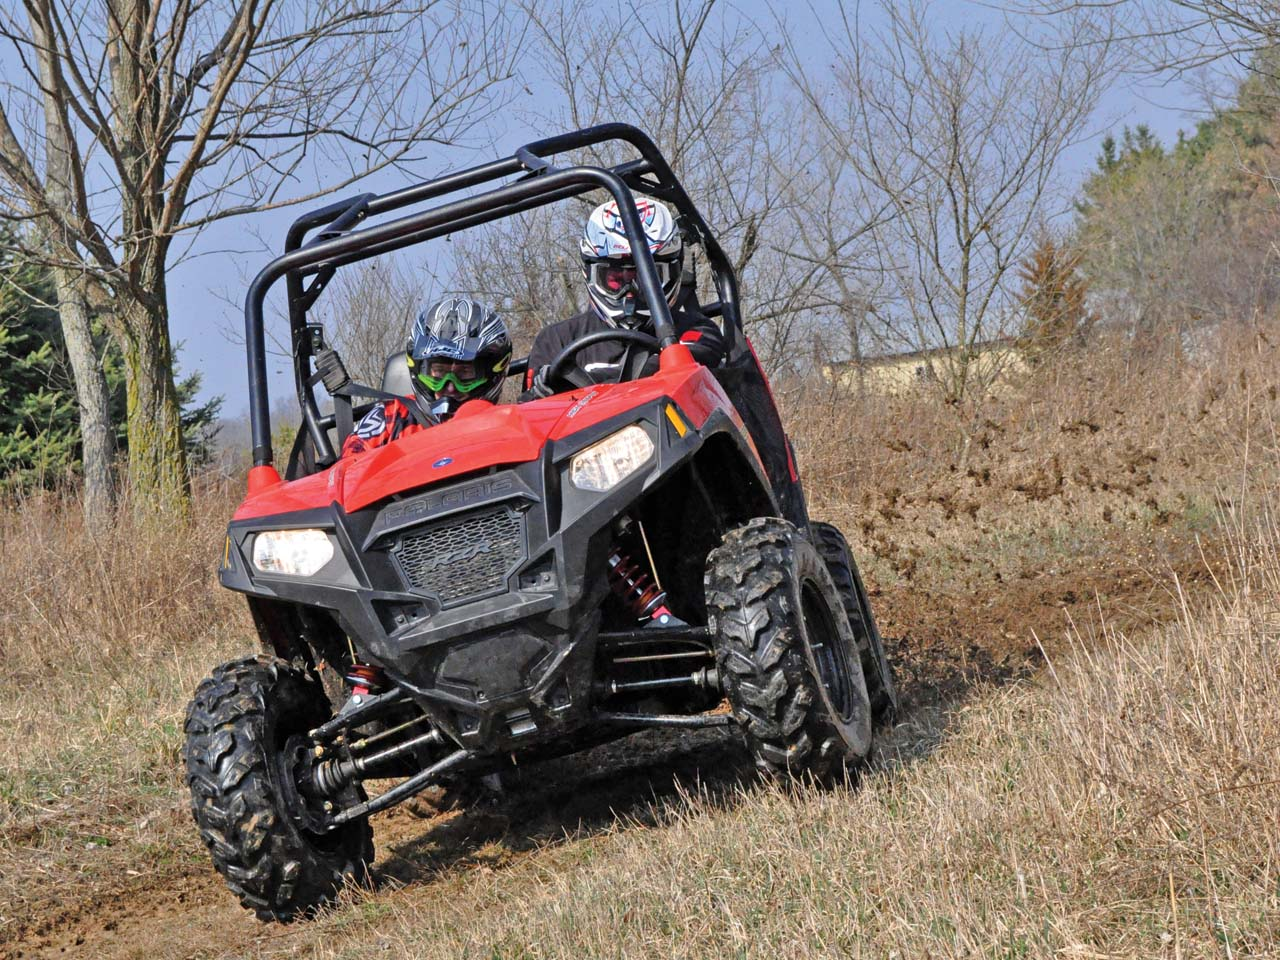 hight resolution of ride tested durablue utv wheel spacers